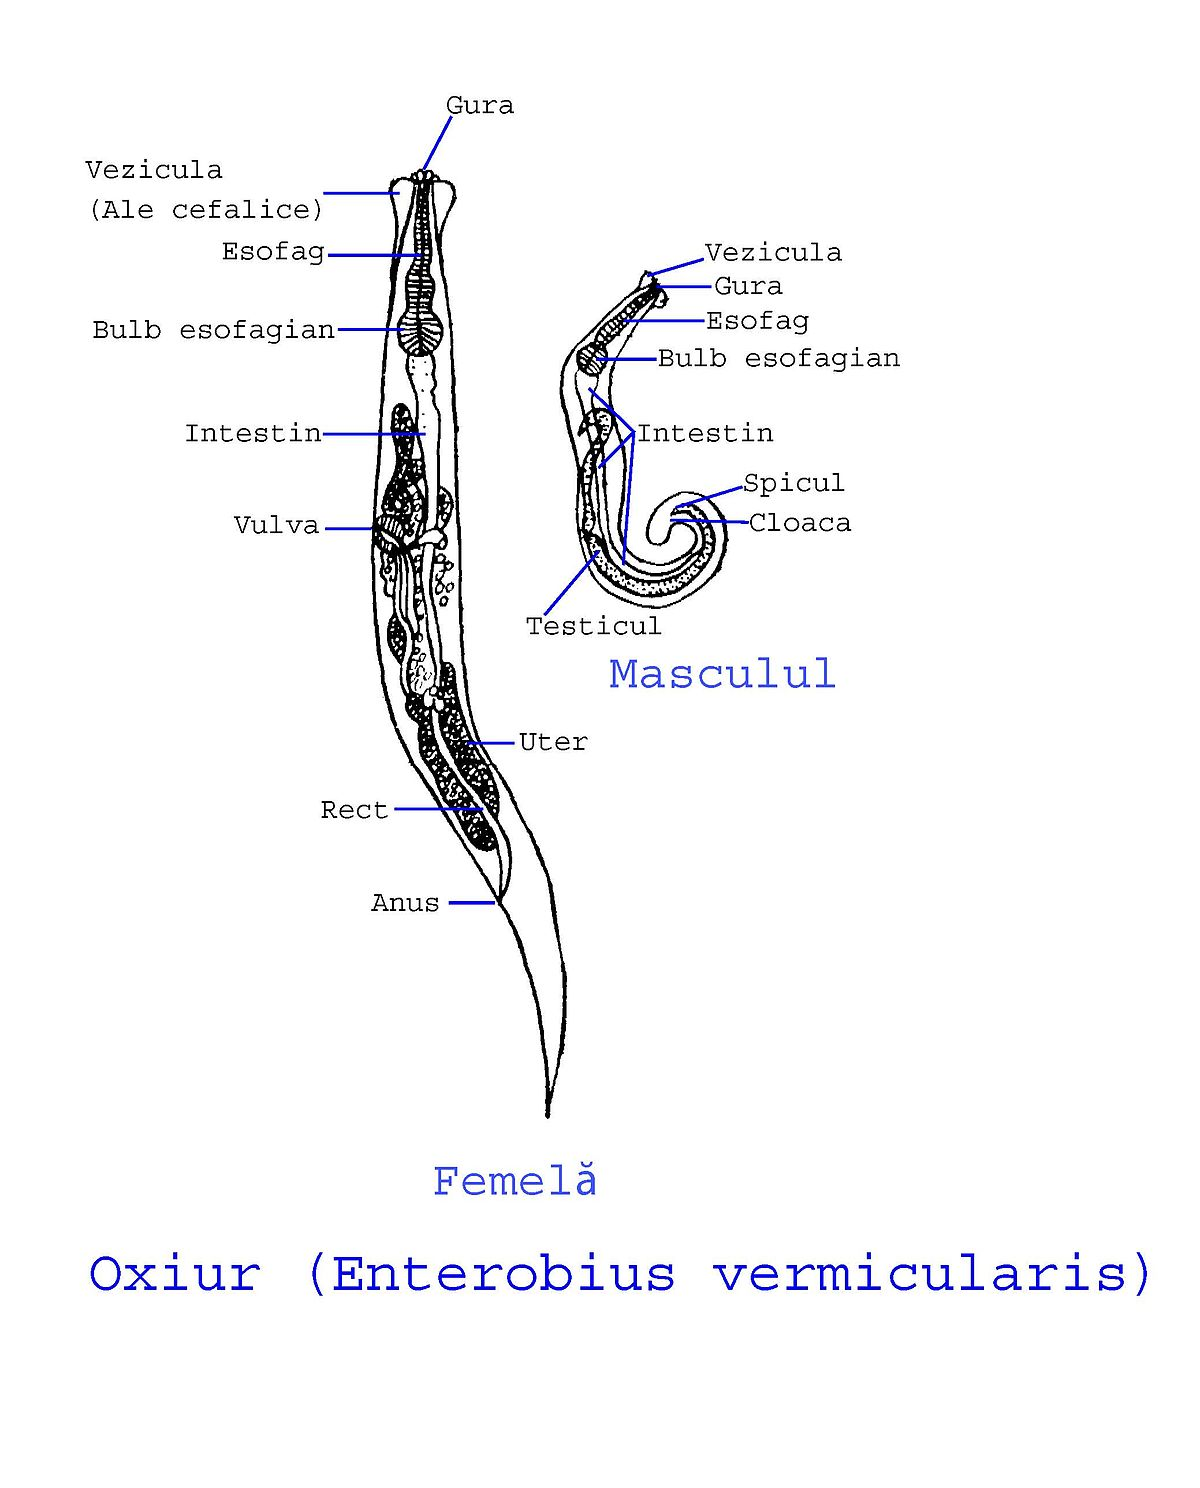 oxiurus como tratamento